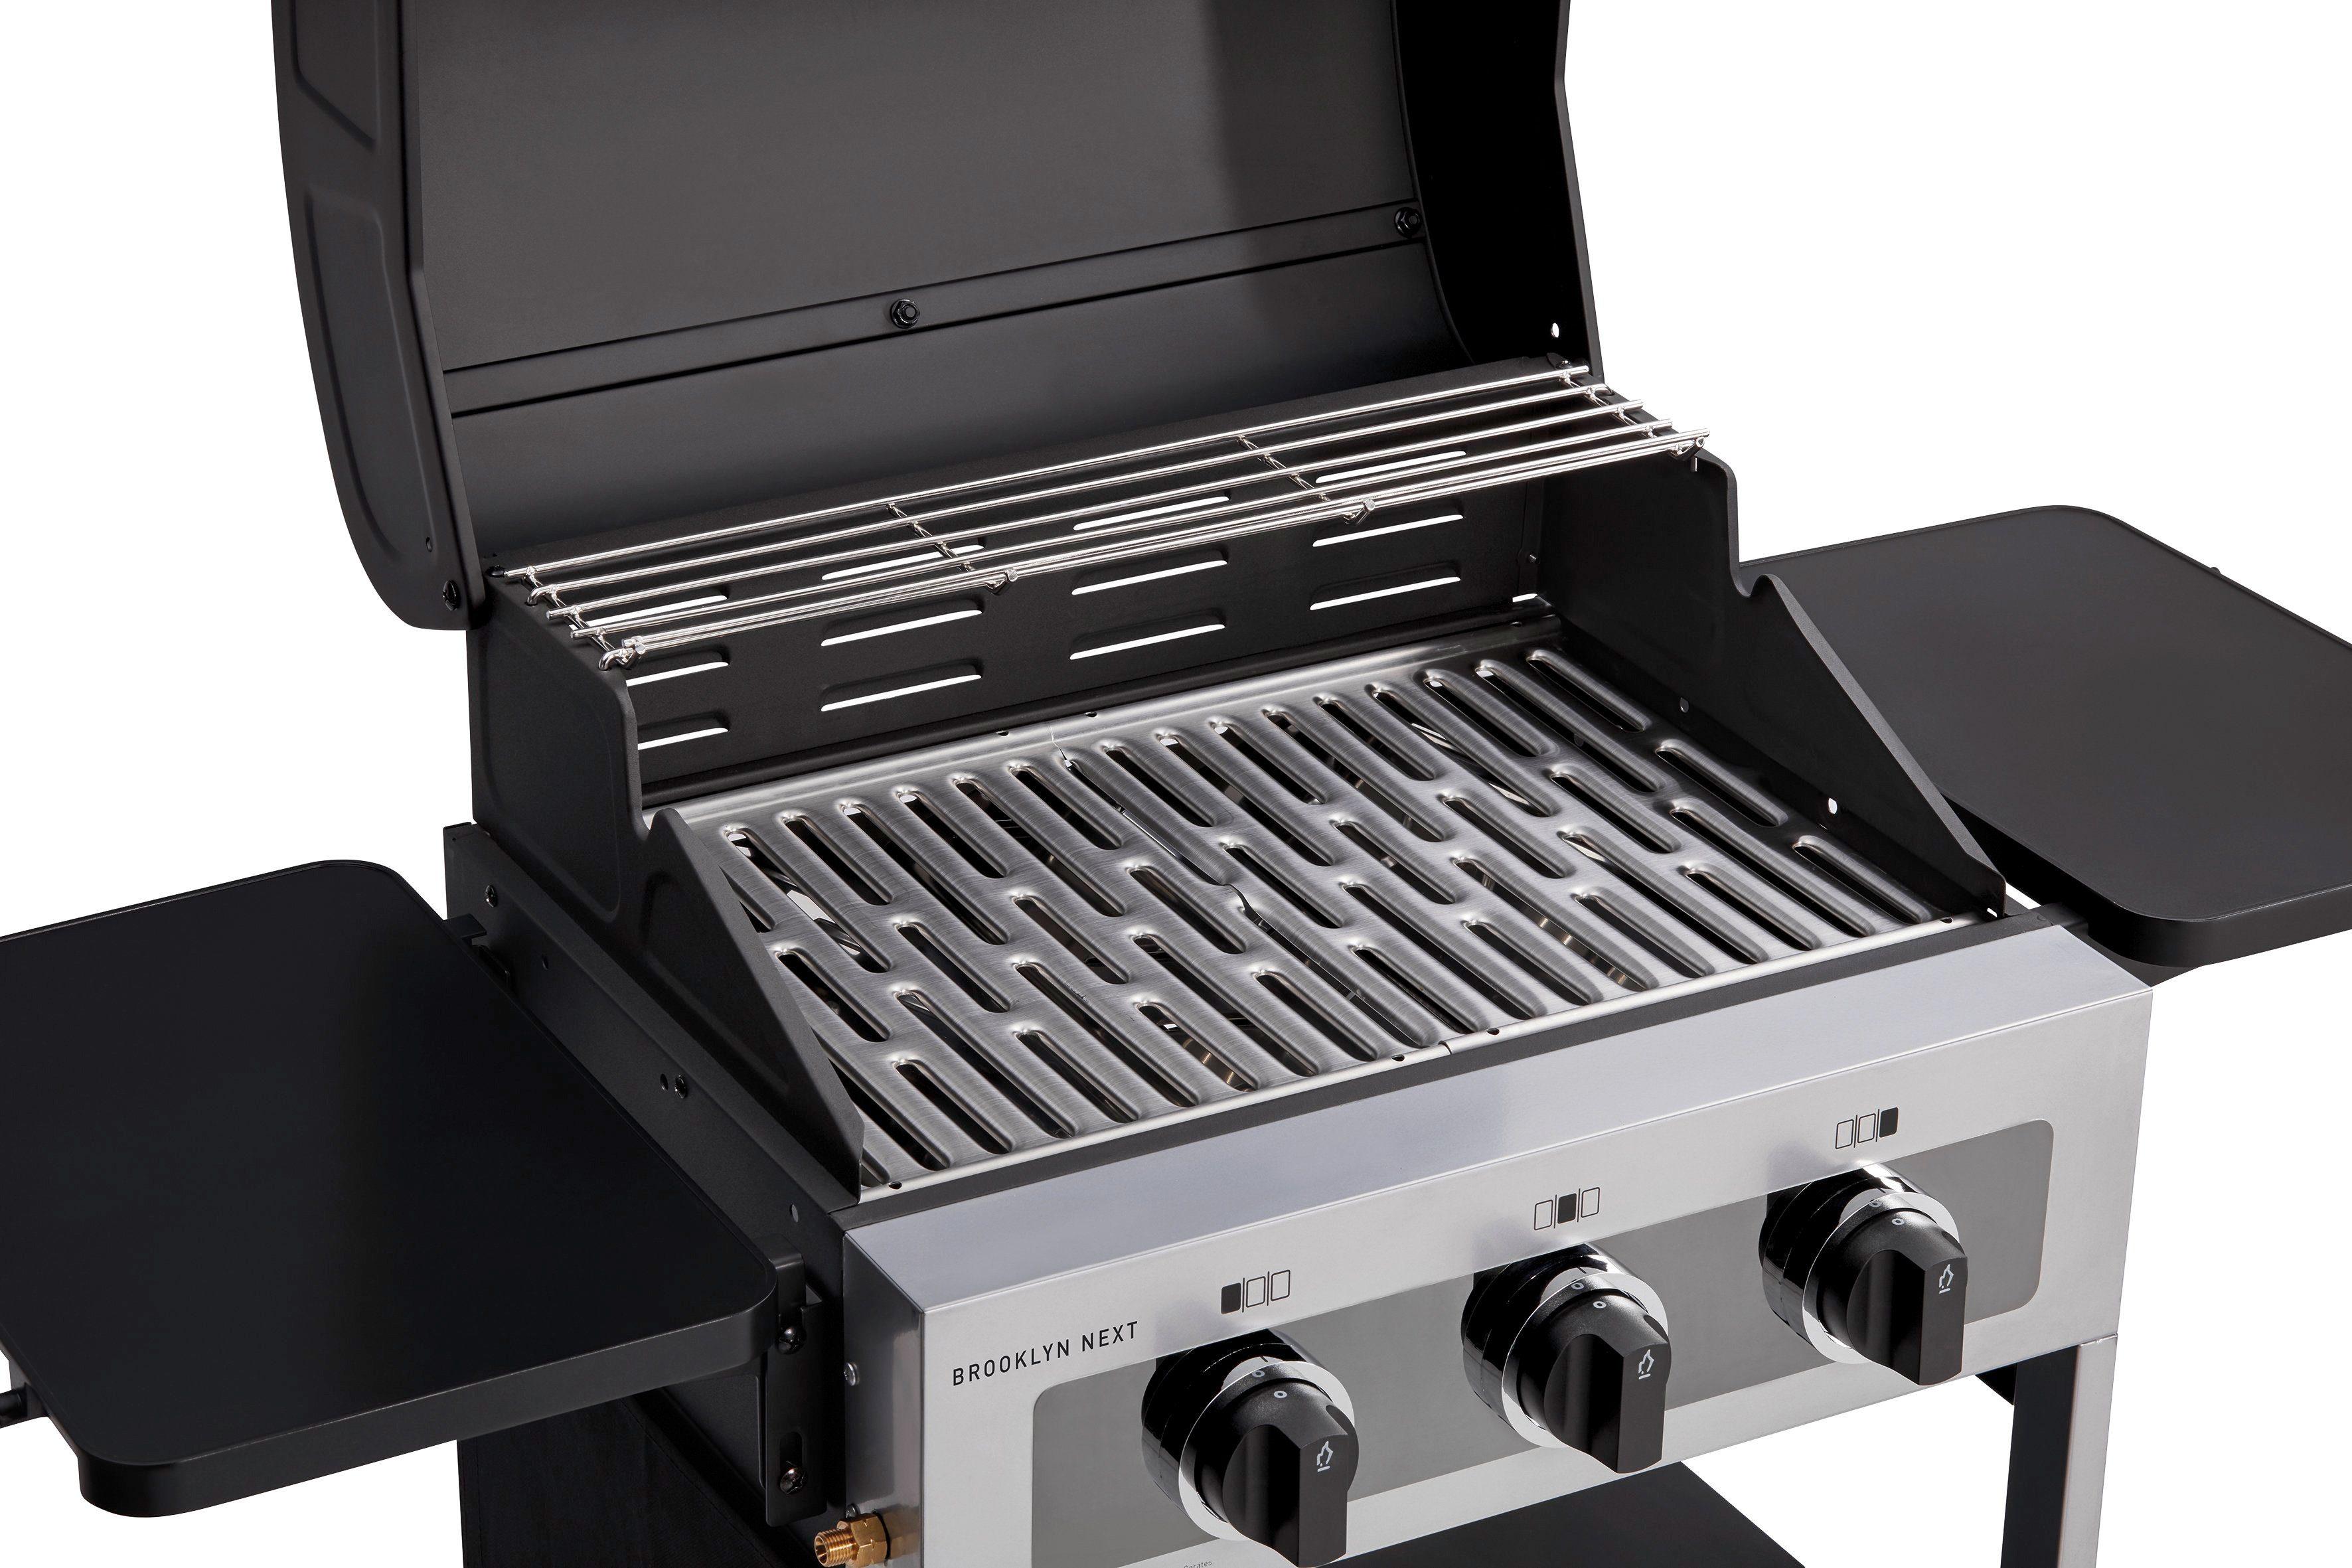 Enders Gasgrill Garantie : Enders gasgrill madison gas grill